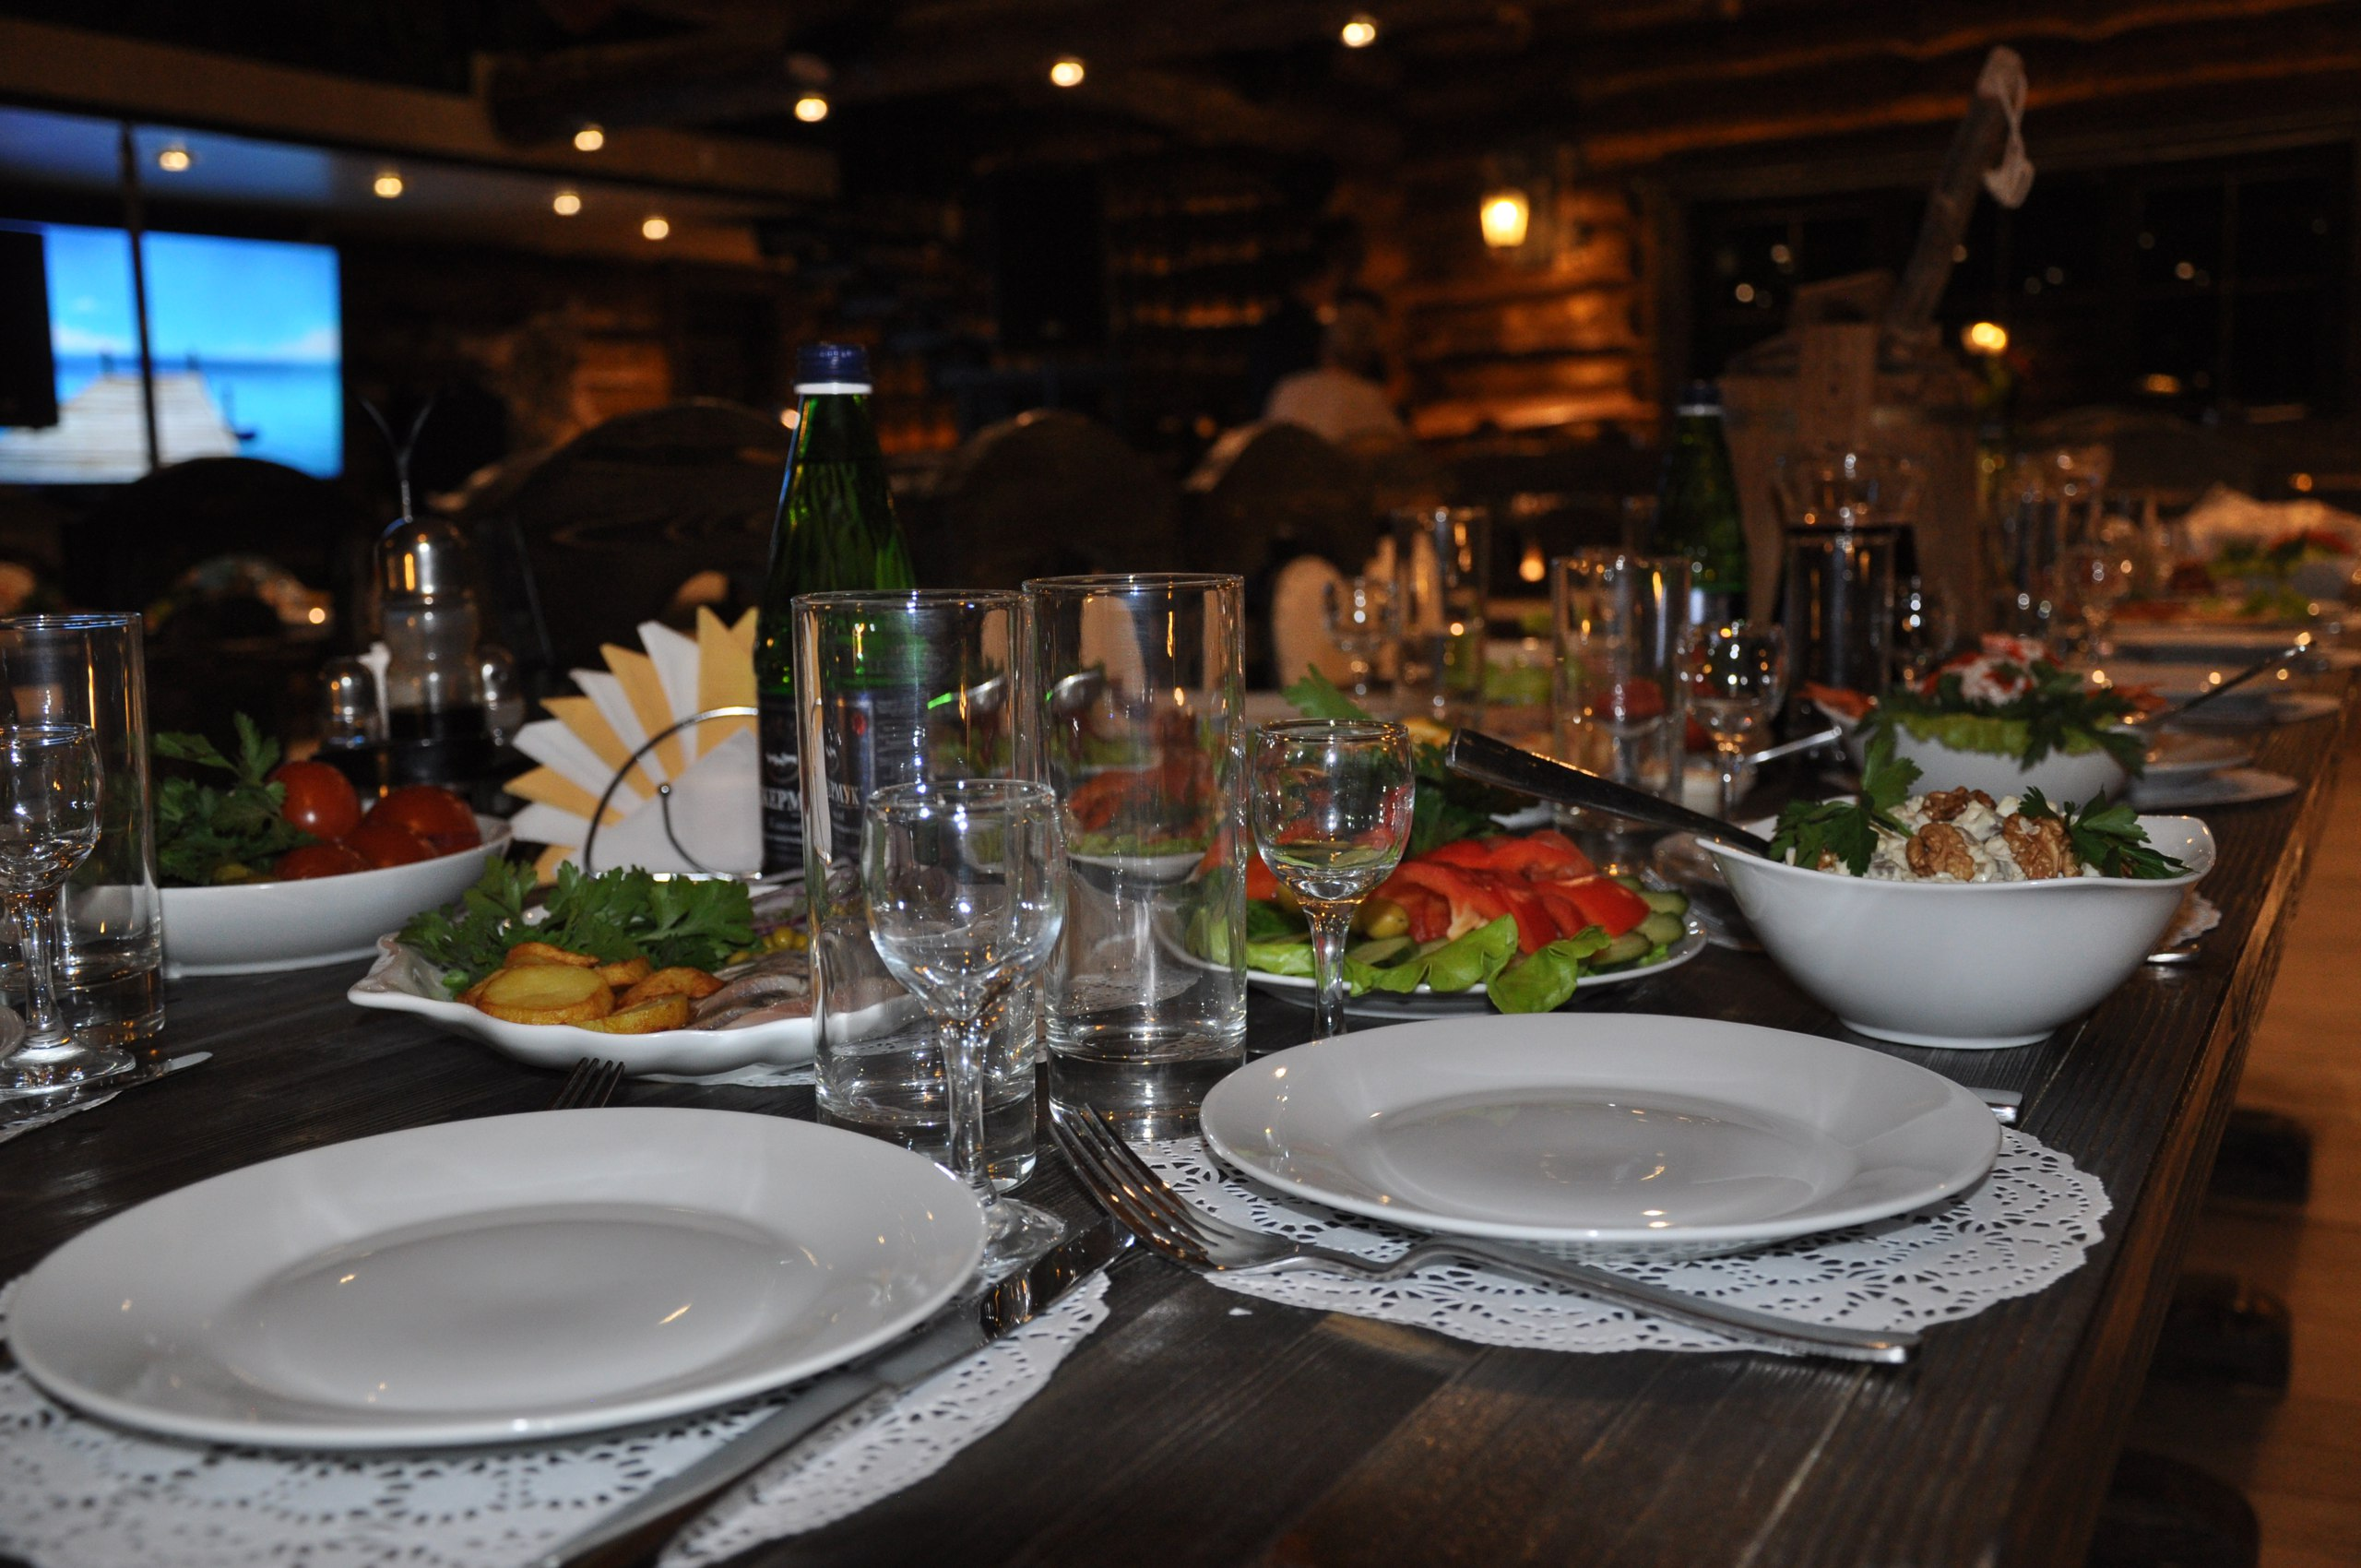 Ресторан «Усадьба Волок»